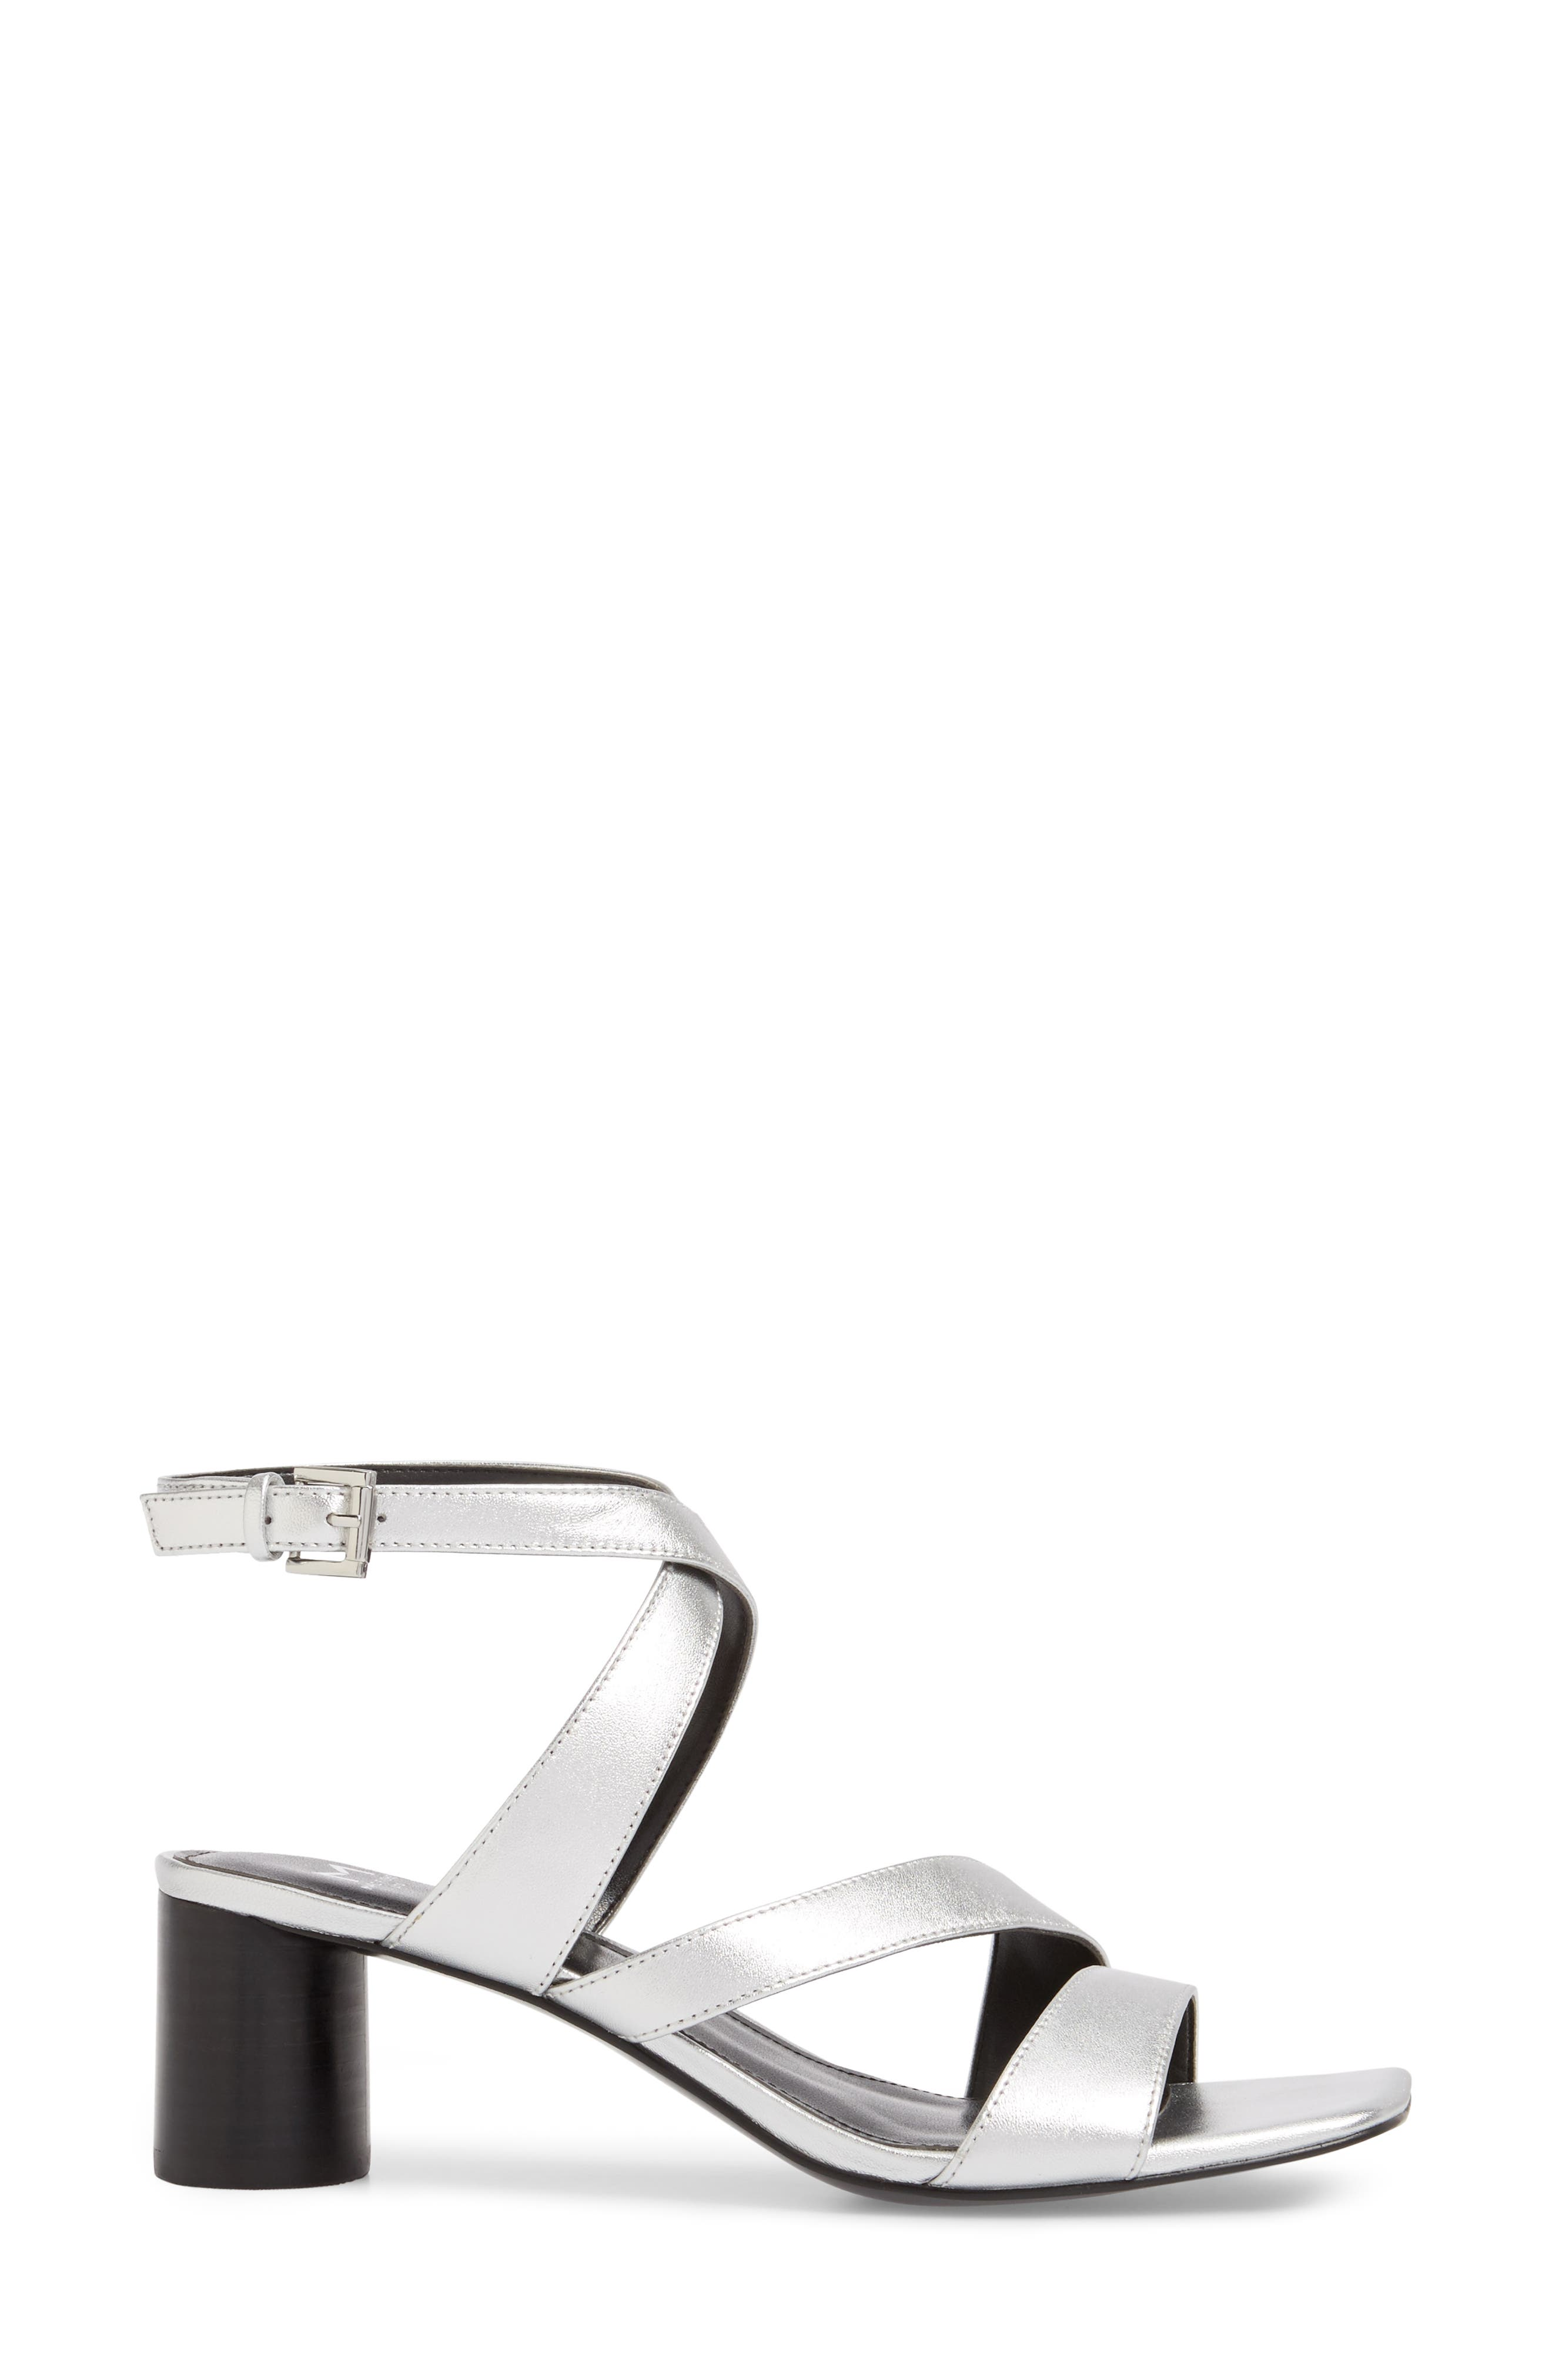 Marc Fischer LTD Idana Strappy Sandal,                             Alternate thumbnail 3, color,                             Silver Leather